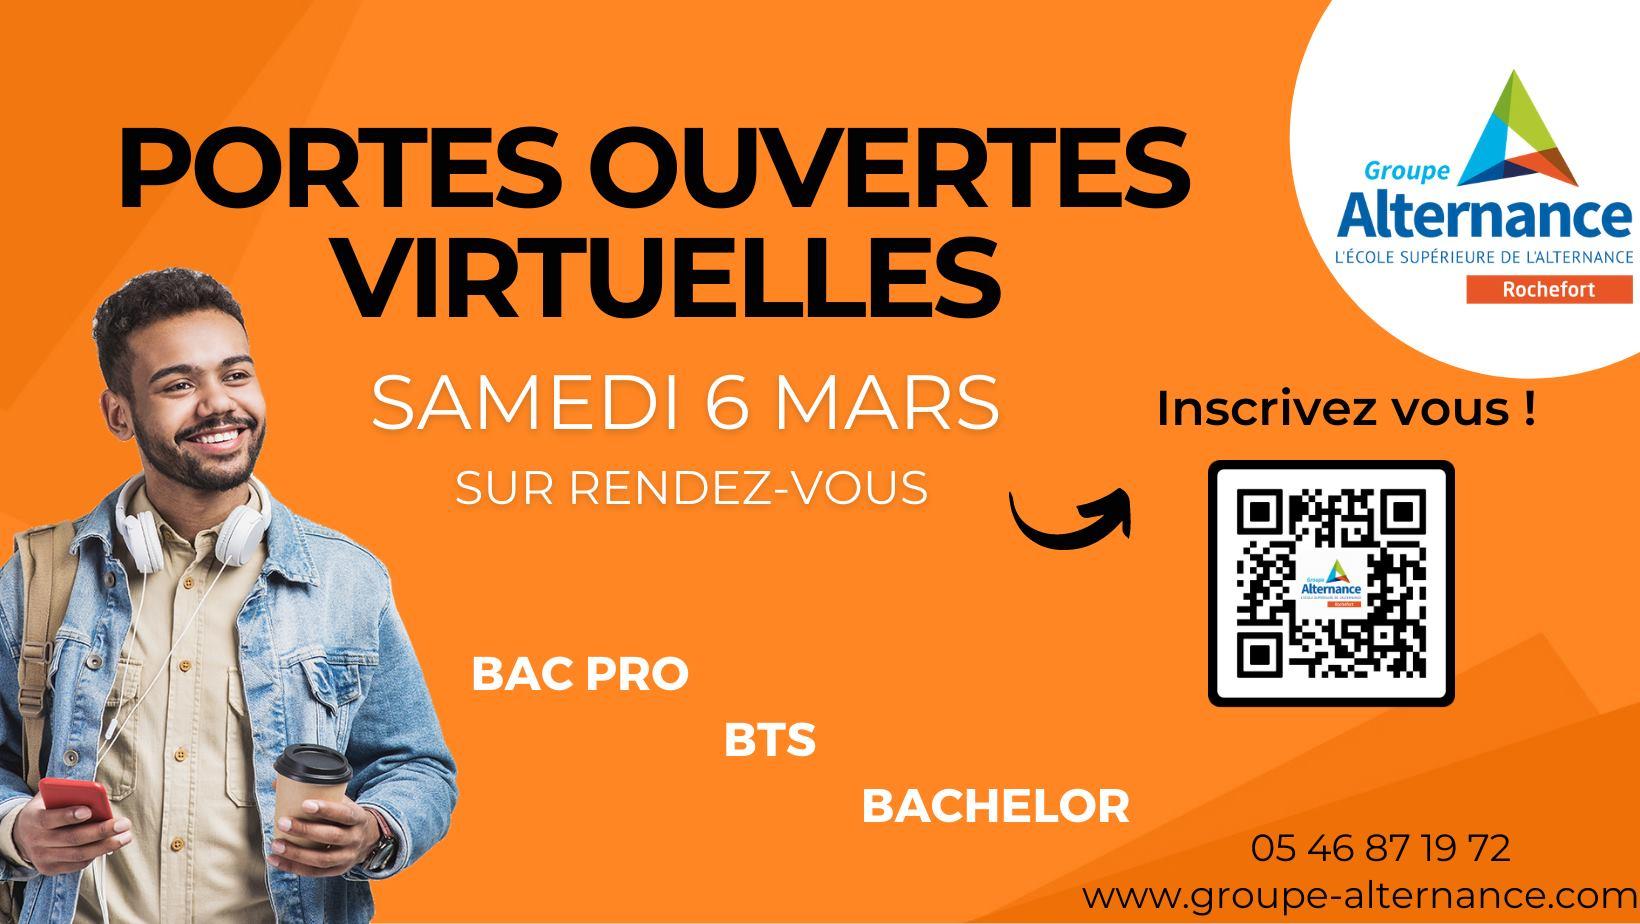 Portes ouvertes virtuelles en ligne Groupe alternance Rochefort